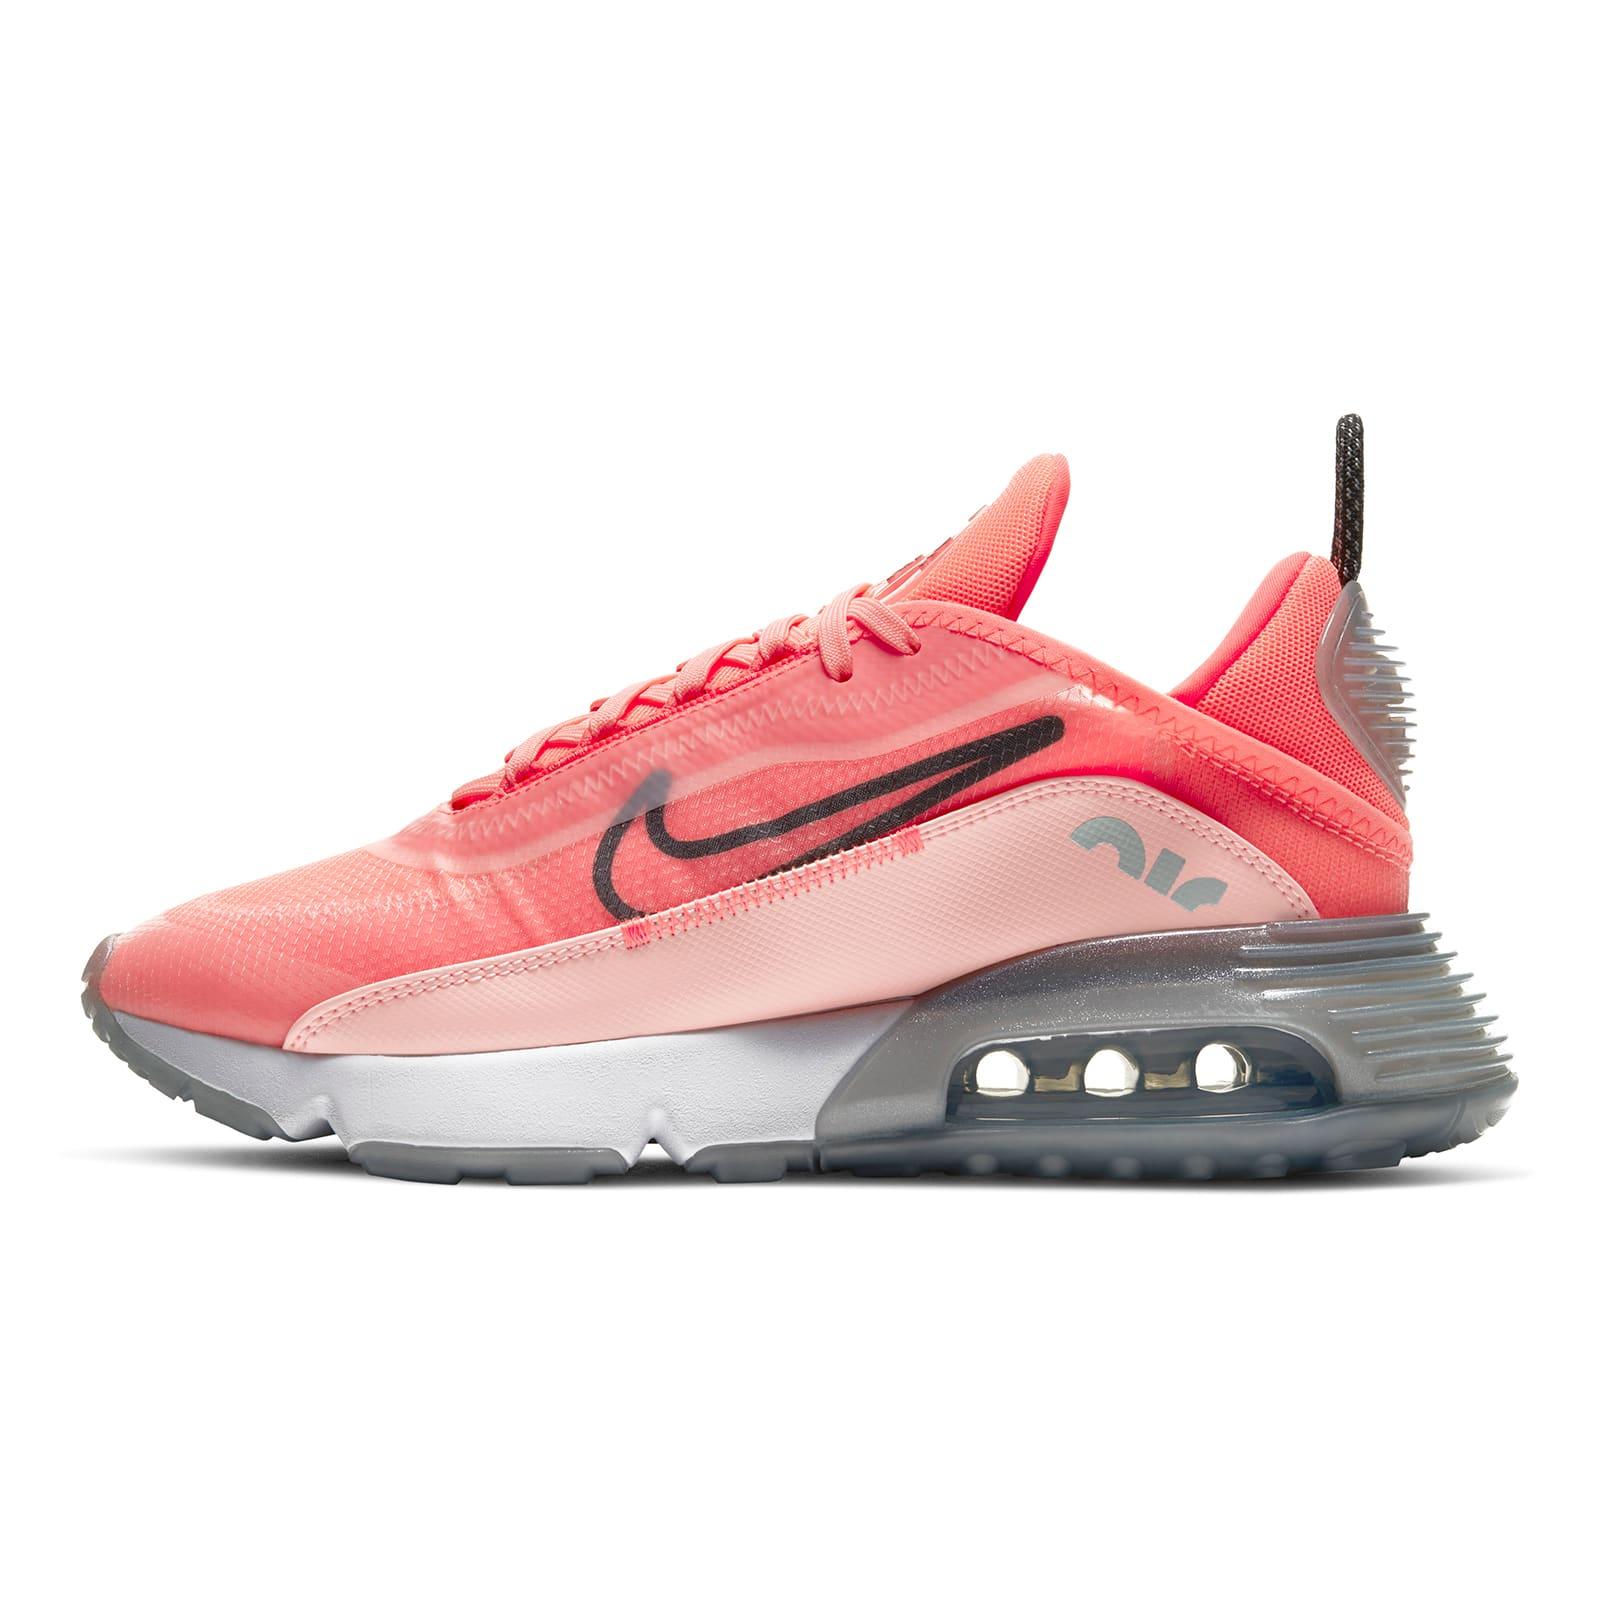 Розовые Air Max 2090